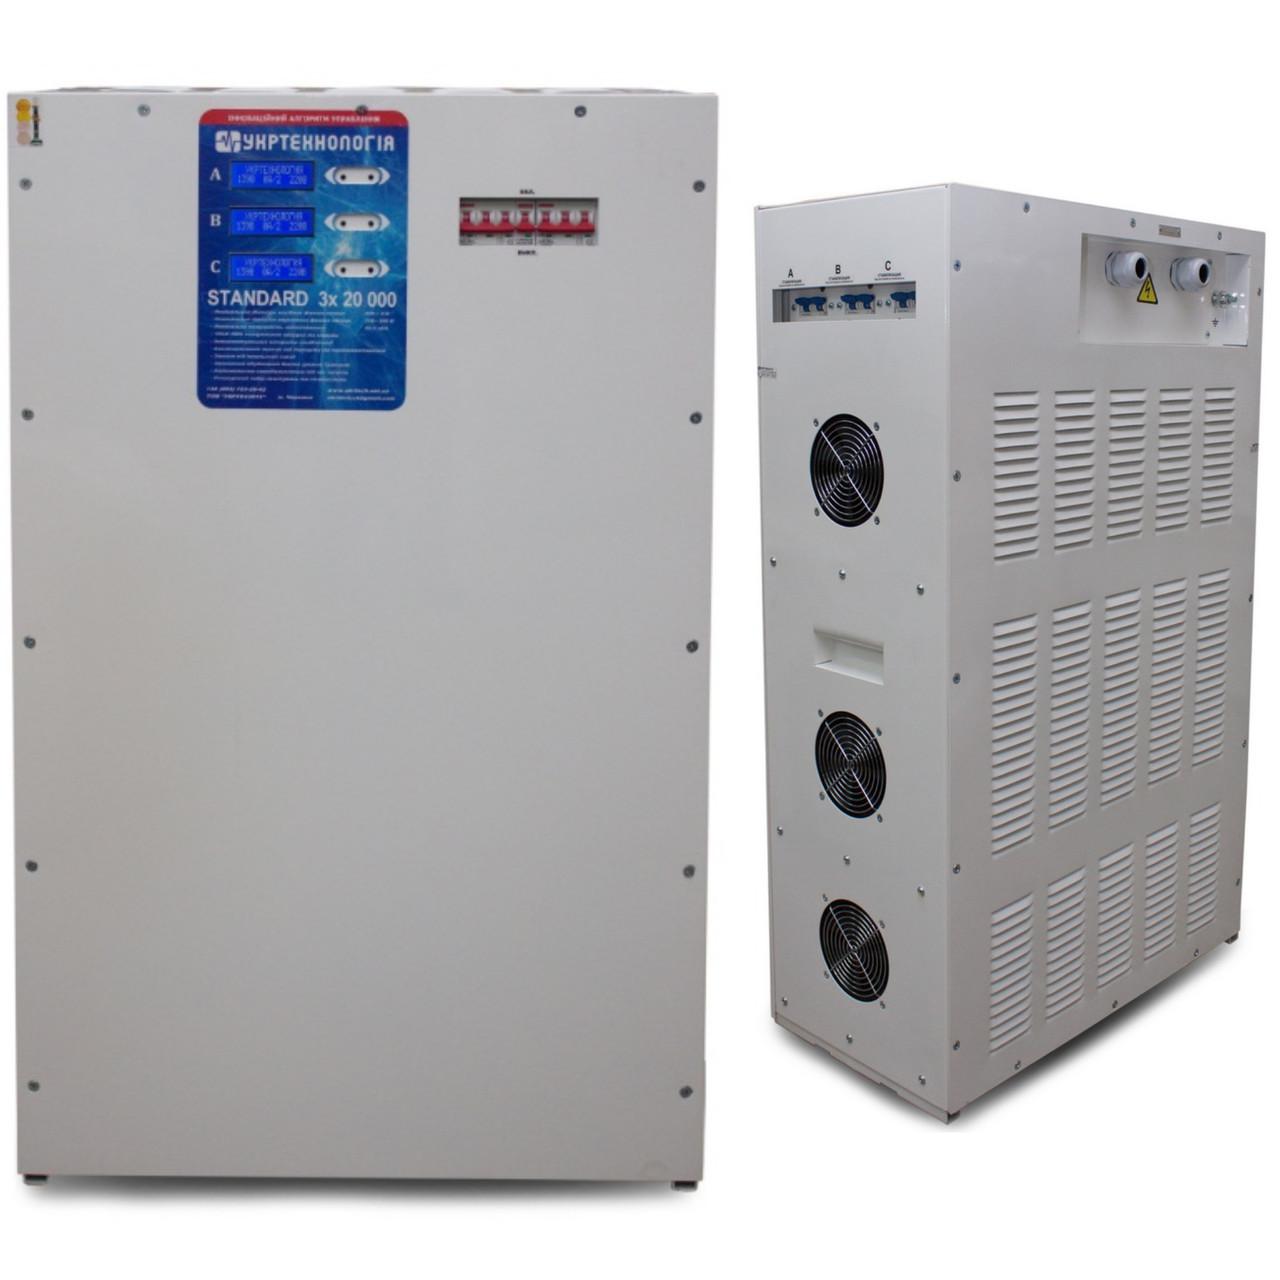 Стабилизатор напряжения Укртехнология HCH 3x7500 Optimum LV 21,12 кВт